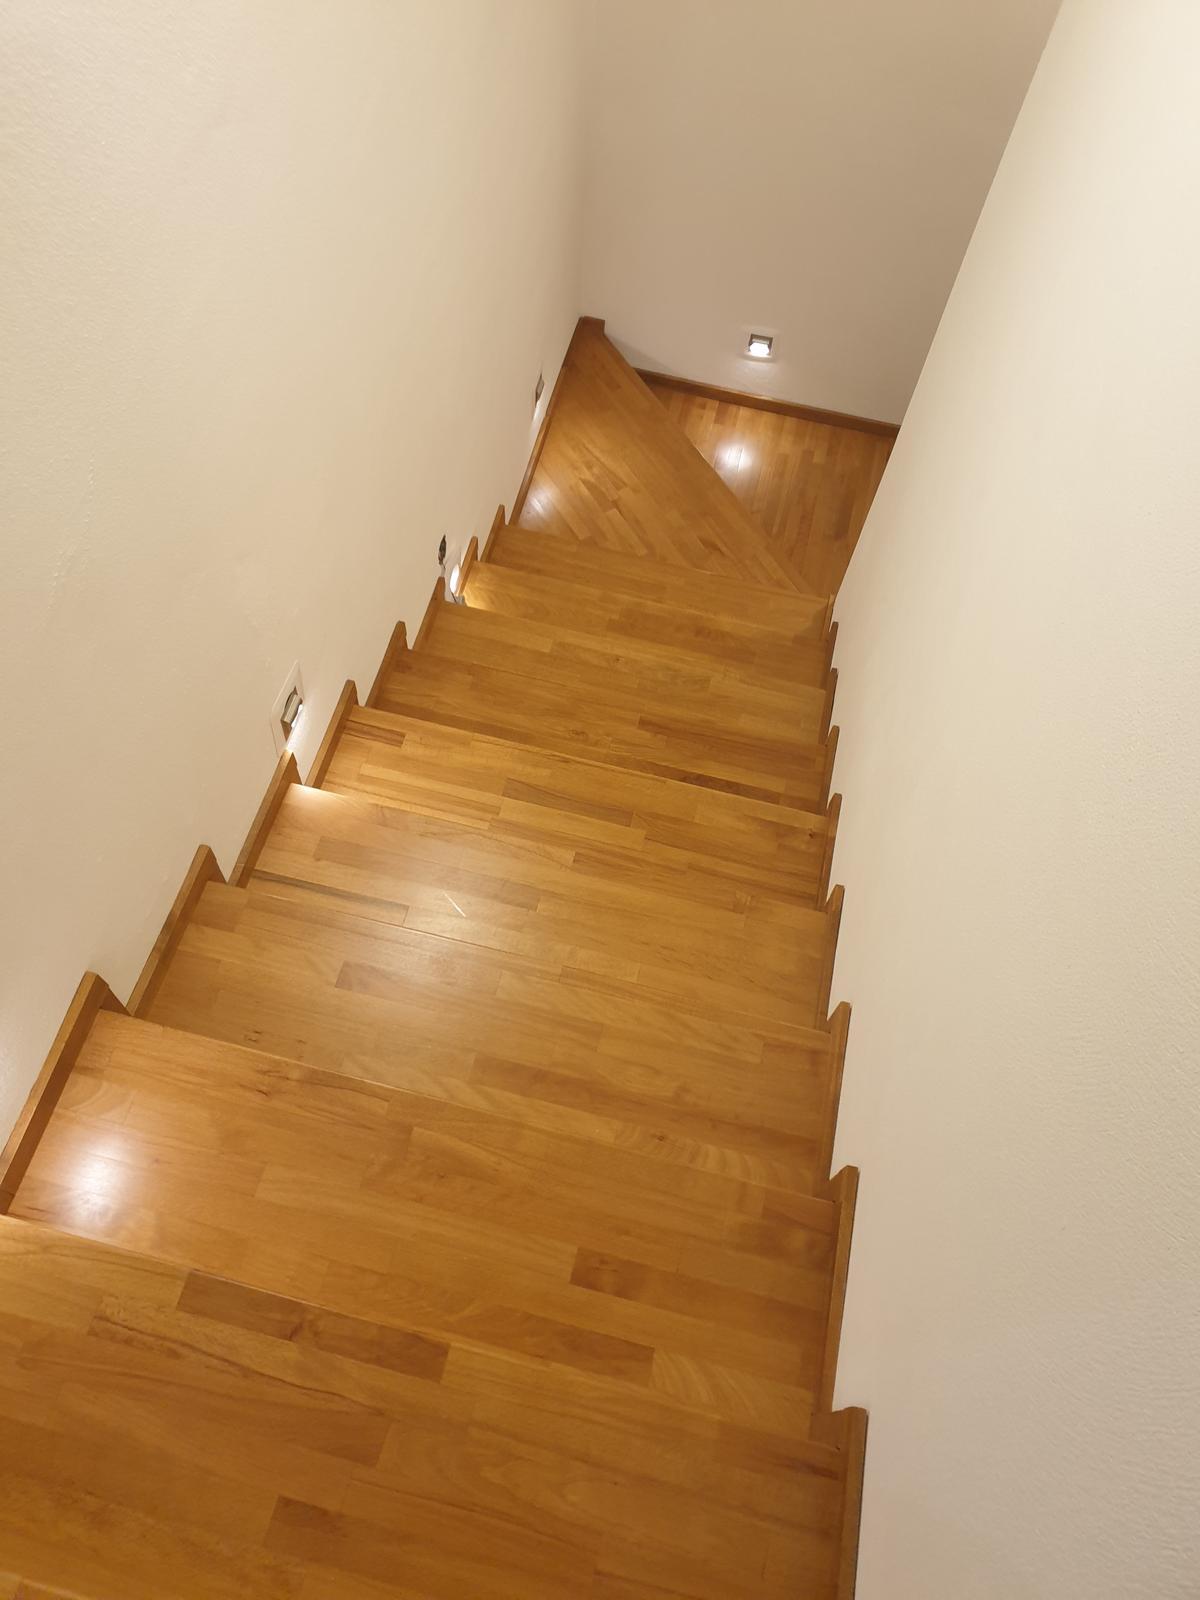 Konzolové schody - BUK, DUB - Obrázok č. 27